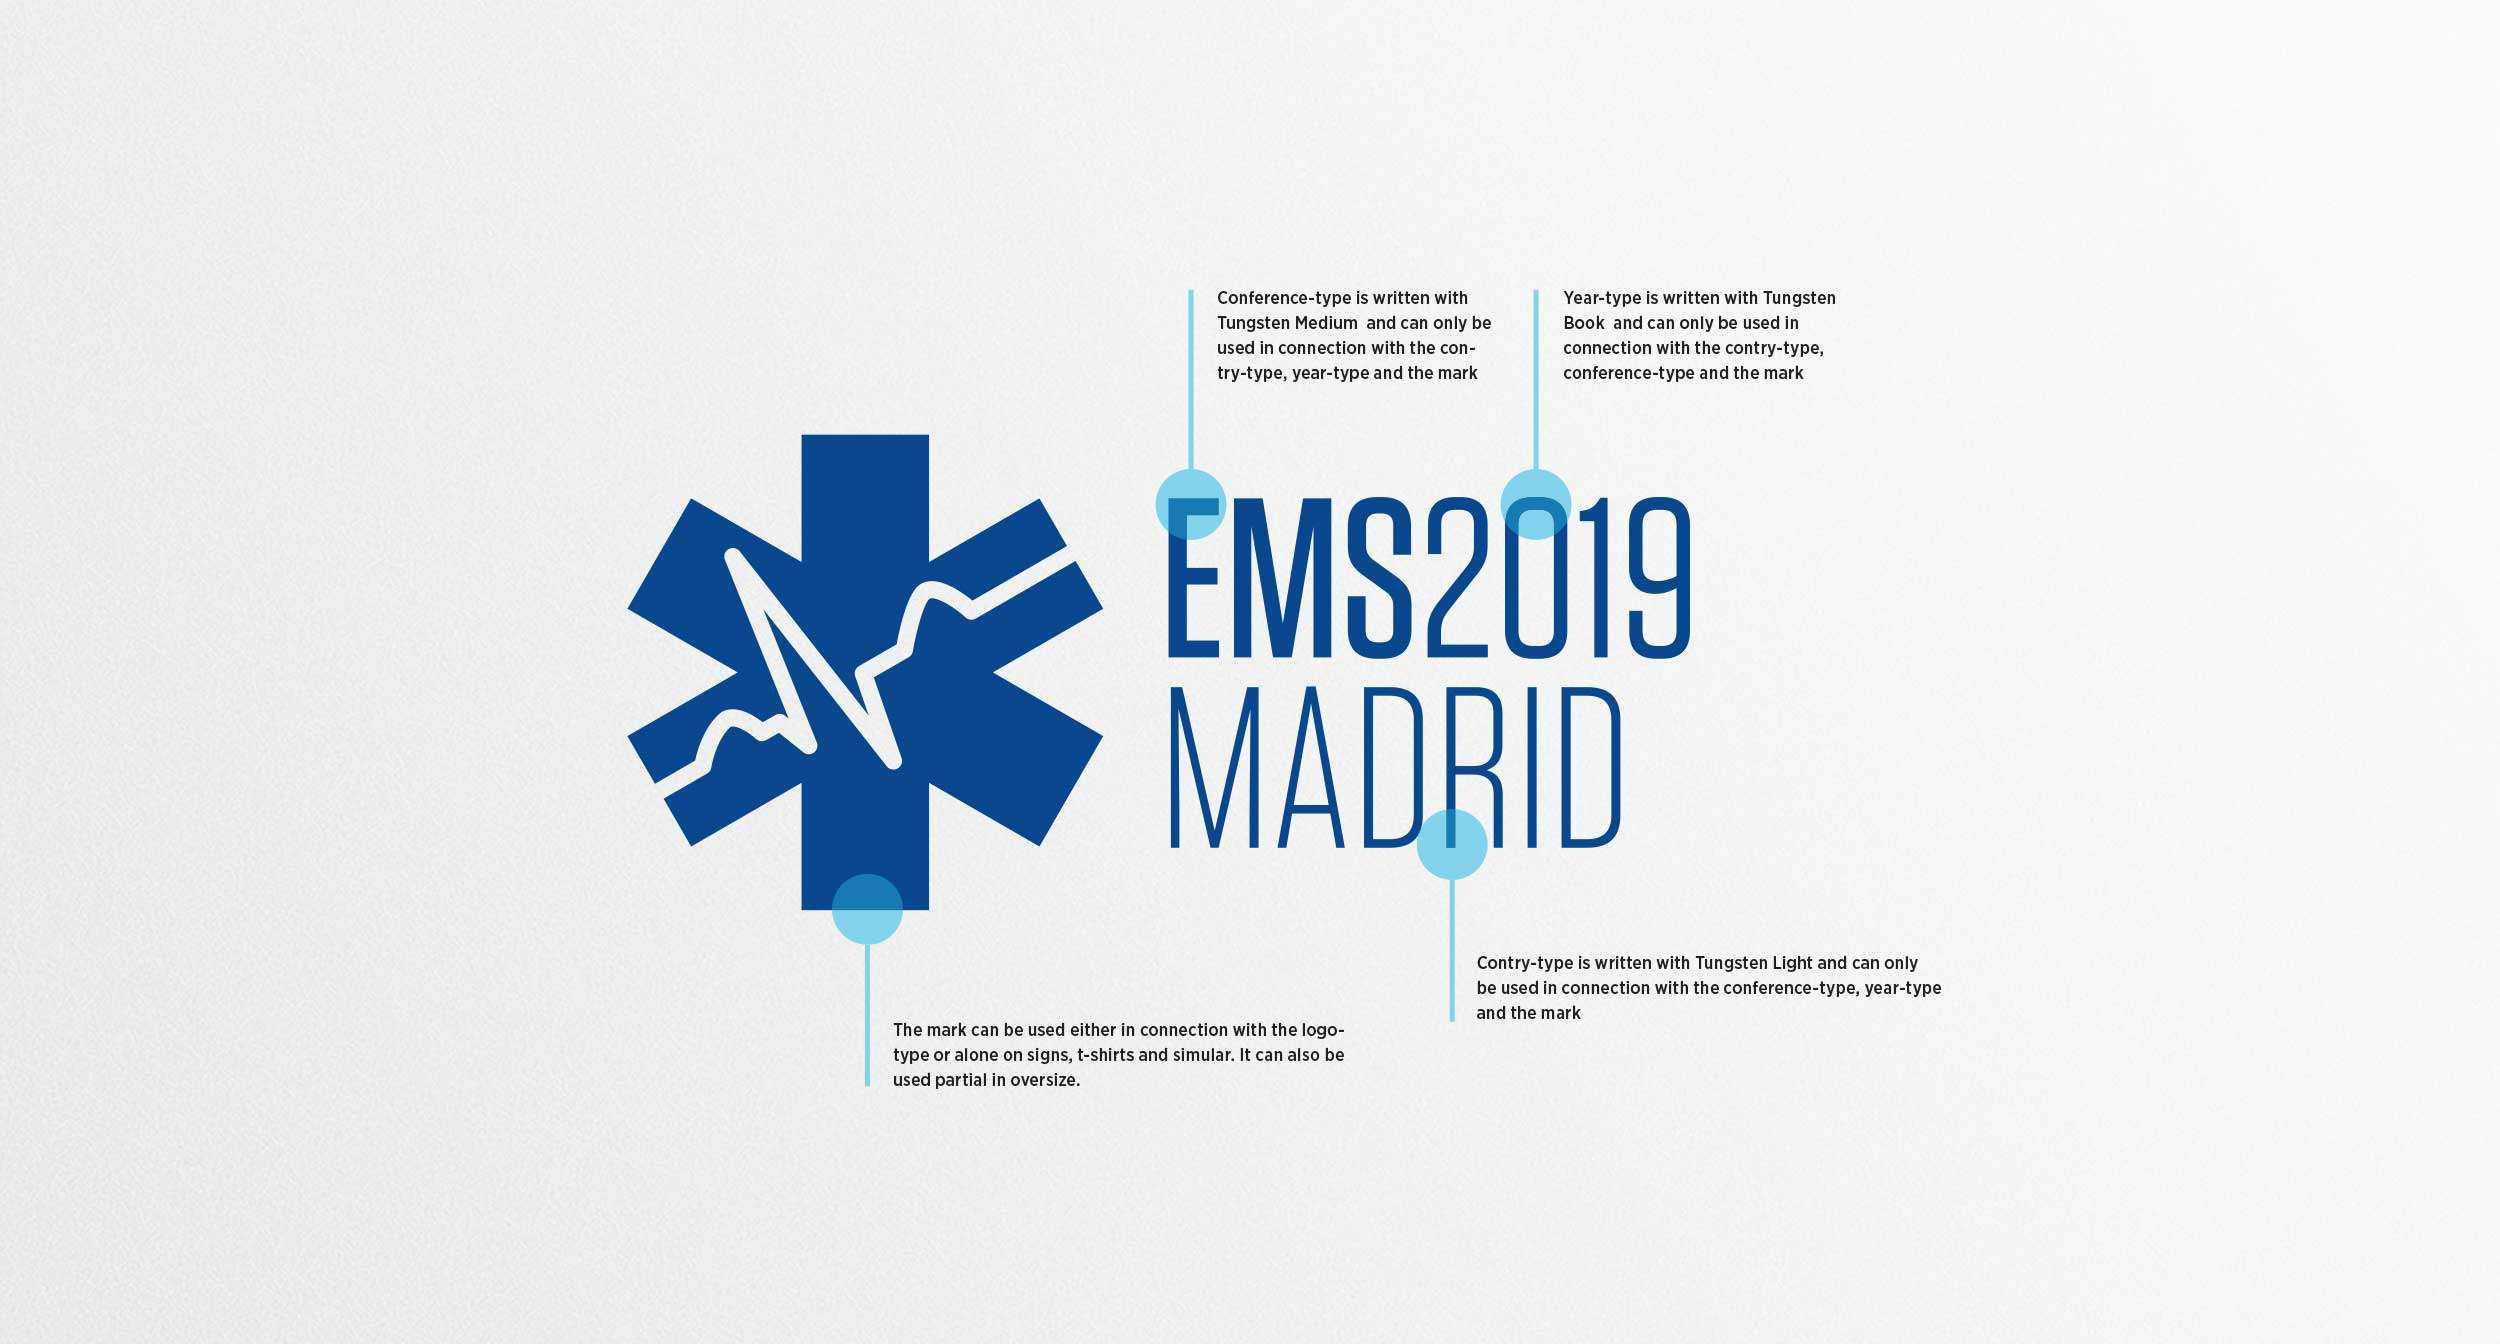 EMS2019 Madrid